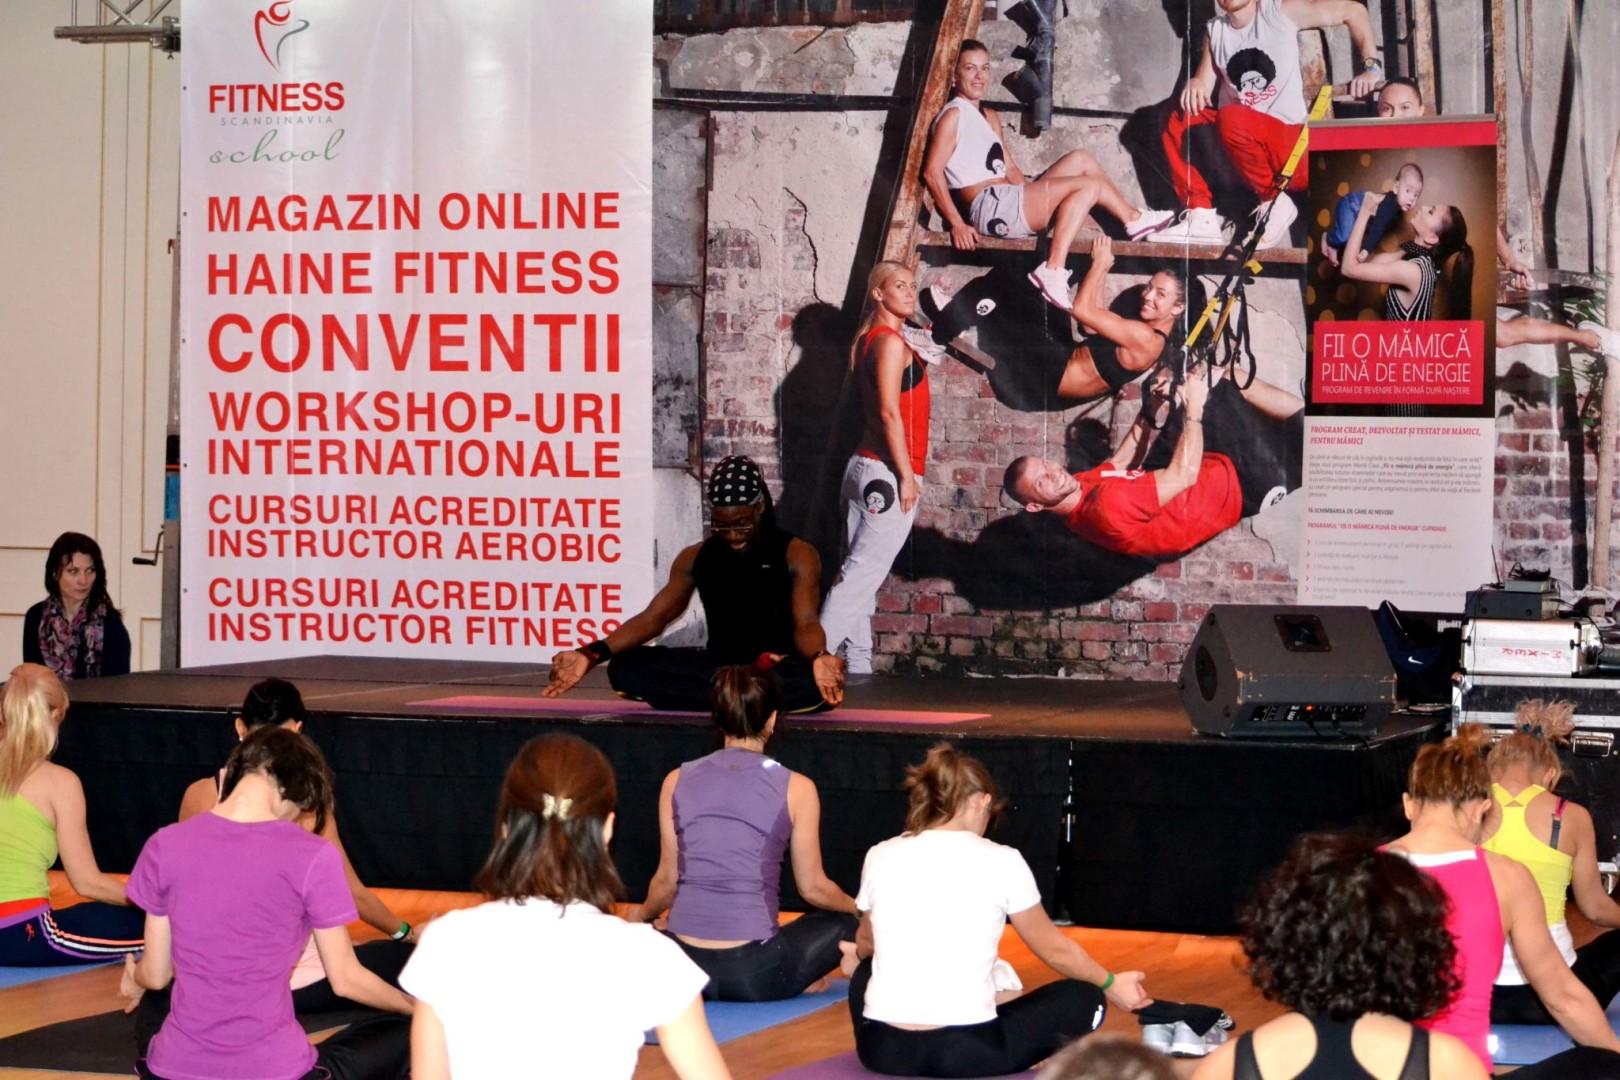 International Fitness Convention 23-24.03.2013